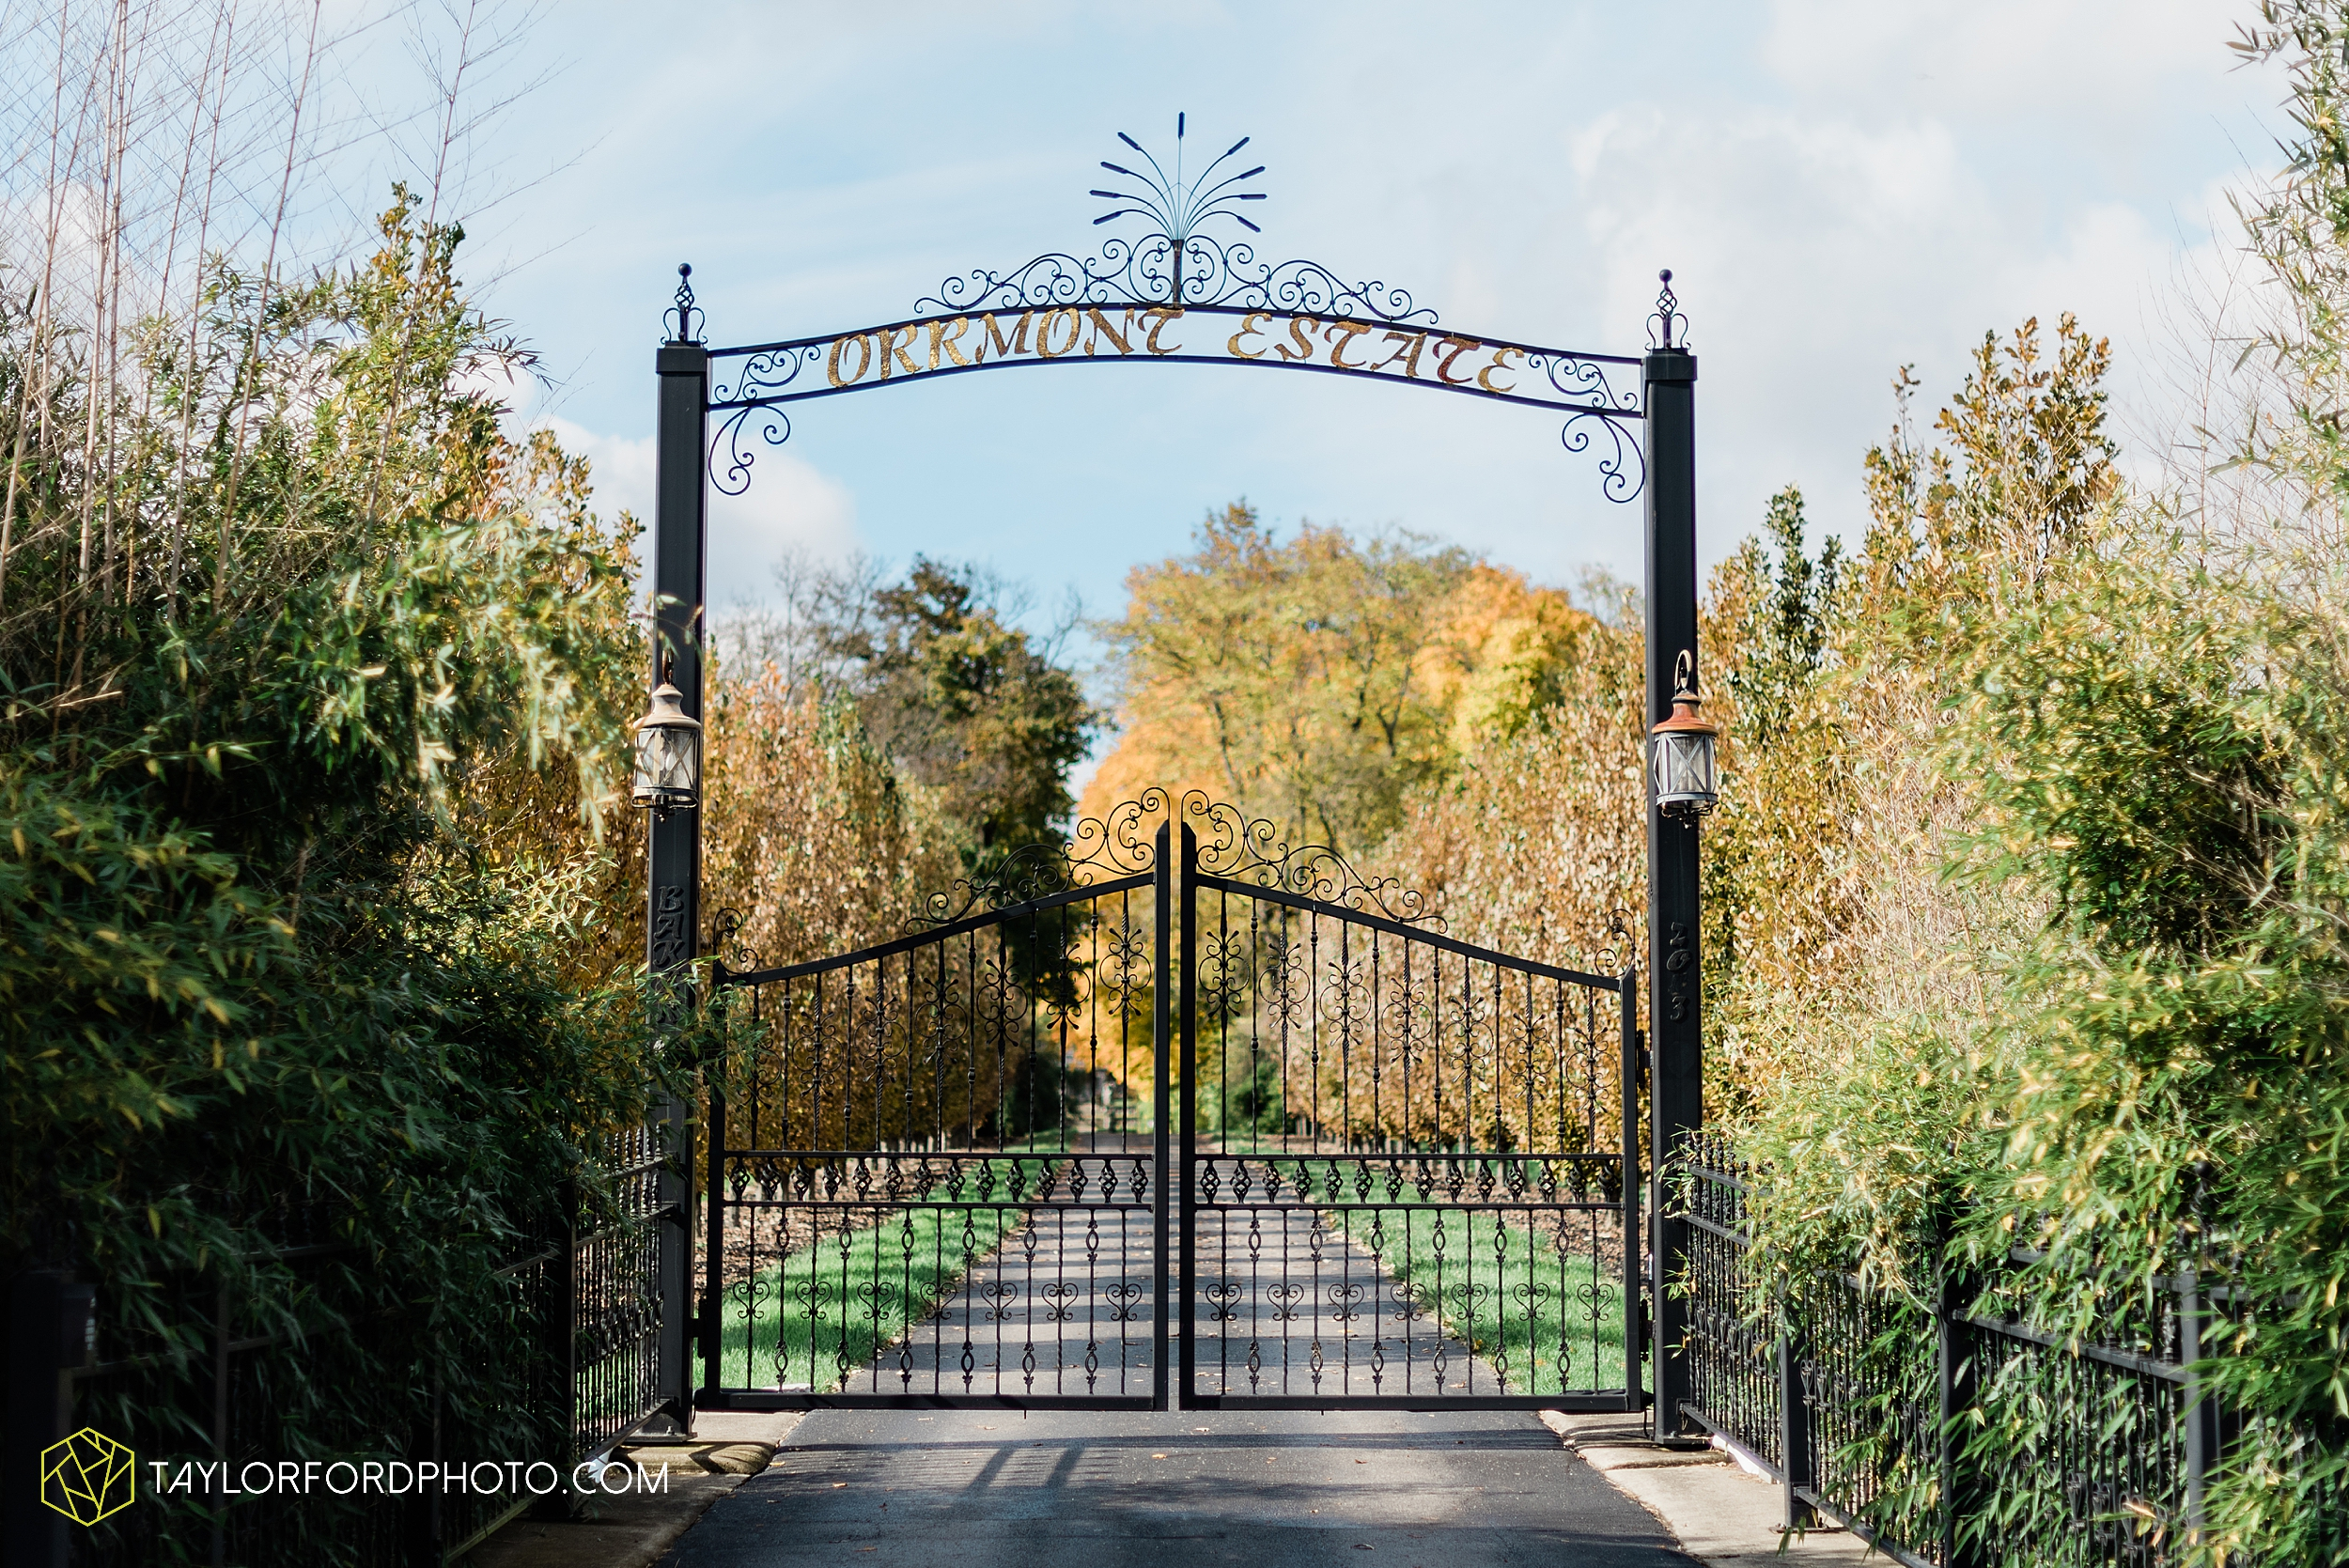 marissa-nicole-nick-daeger-orrmont-estate-farm-wedding-piqua-dayton-troy-ohio-fall-photographer-taylor-ford-photography_1497.jpg